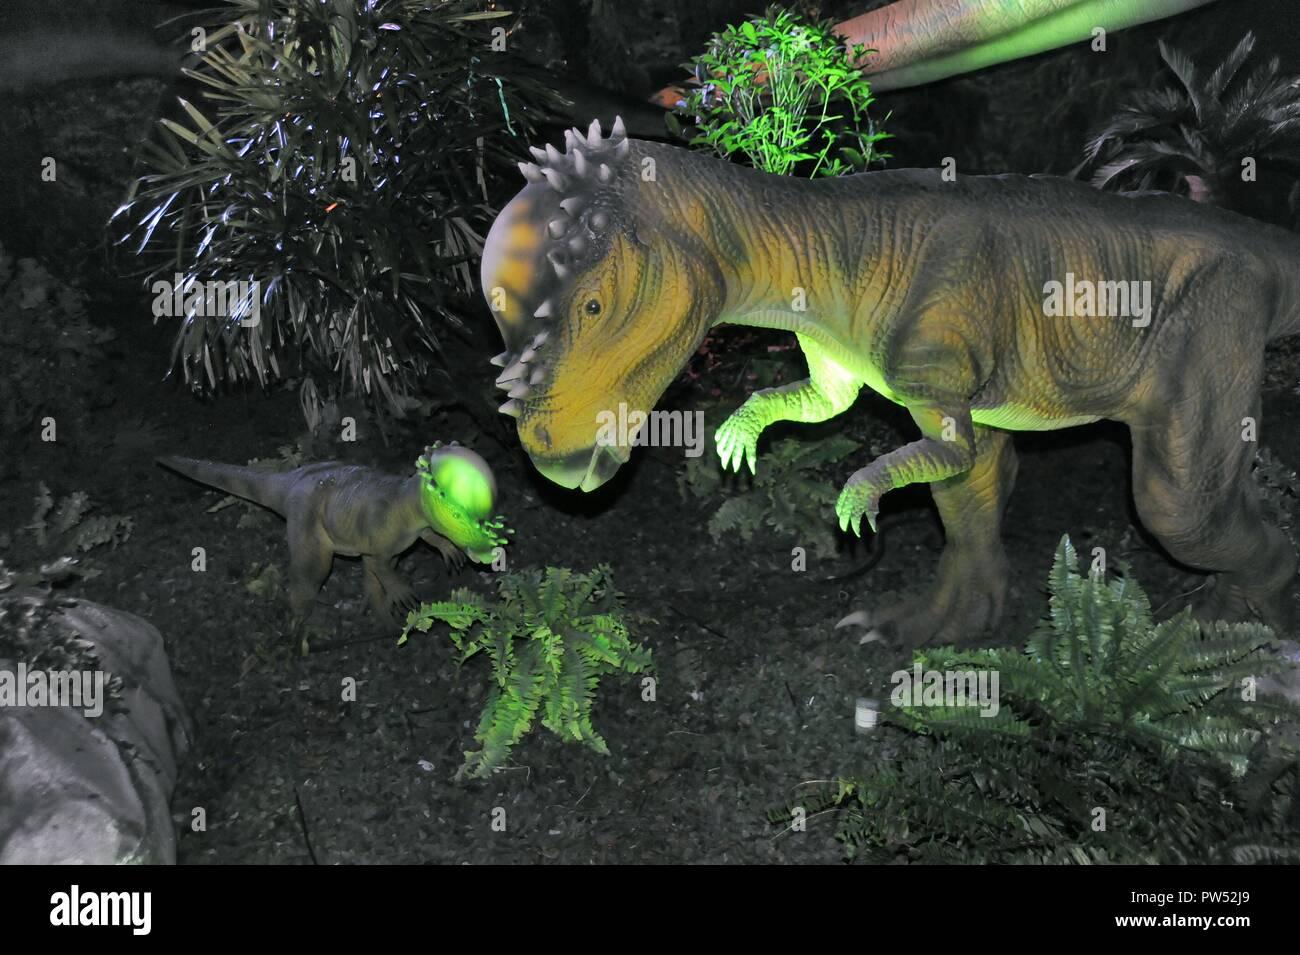 Milan (Italy), exhibition of prehistoric animals reproduced in full size; Pachycephalosaurus (Pachycephalosaurus wyomingensis) - Stock Image